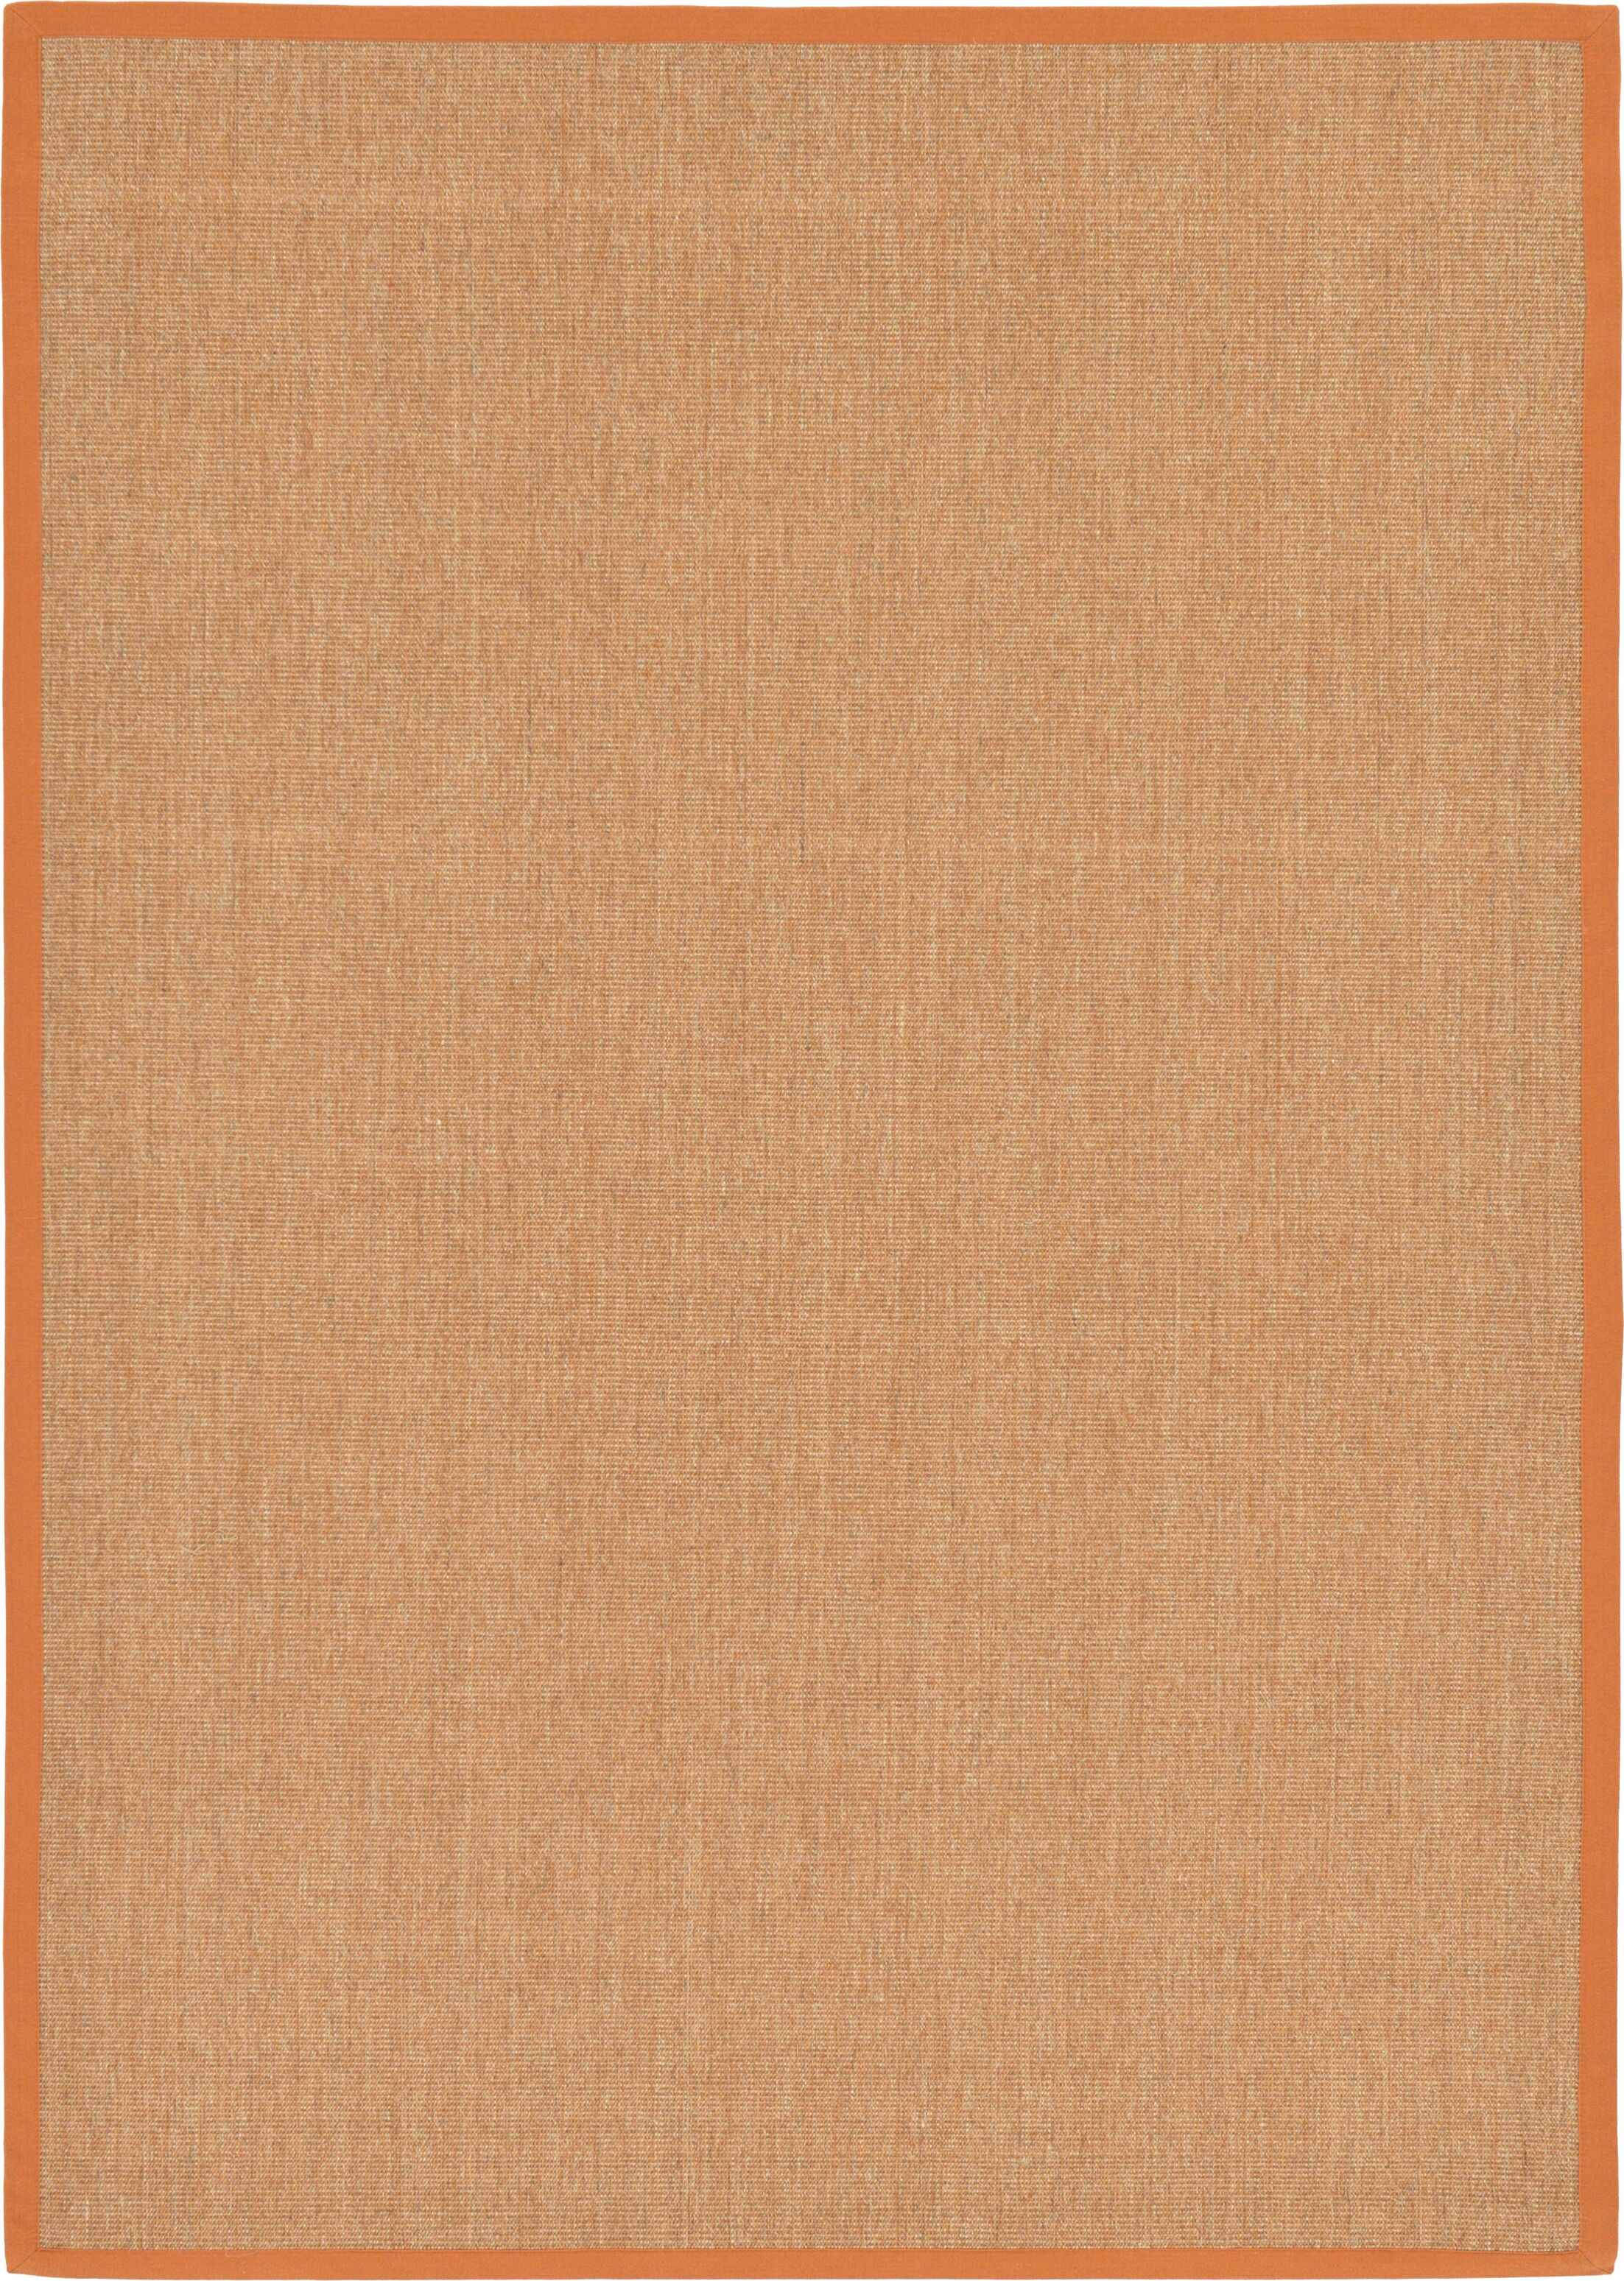 Gryselda Light Brown Area Rug Rug Size: Rectangle 7' x 10'